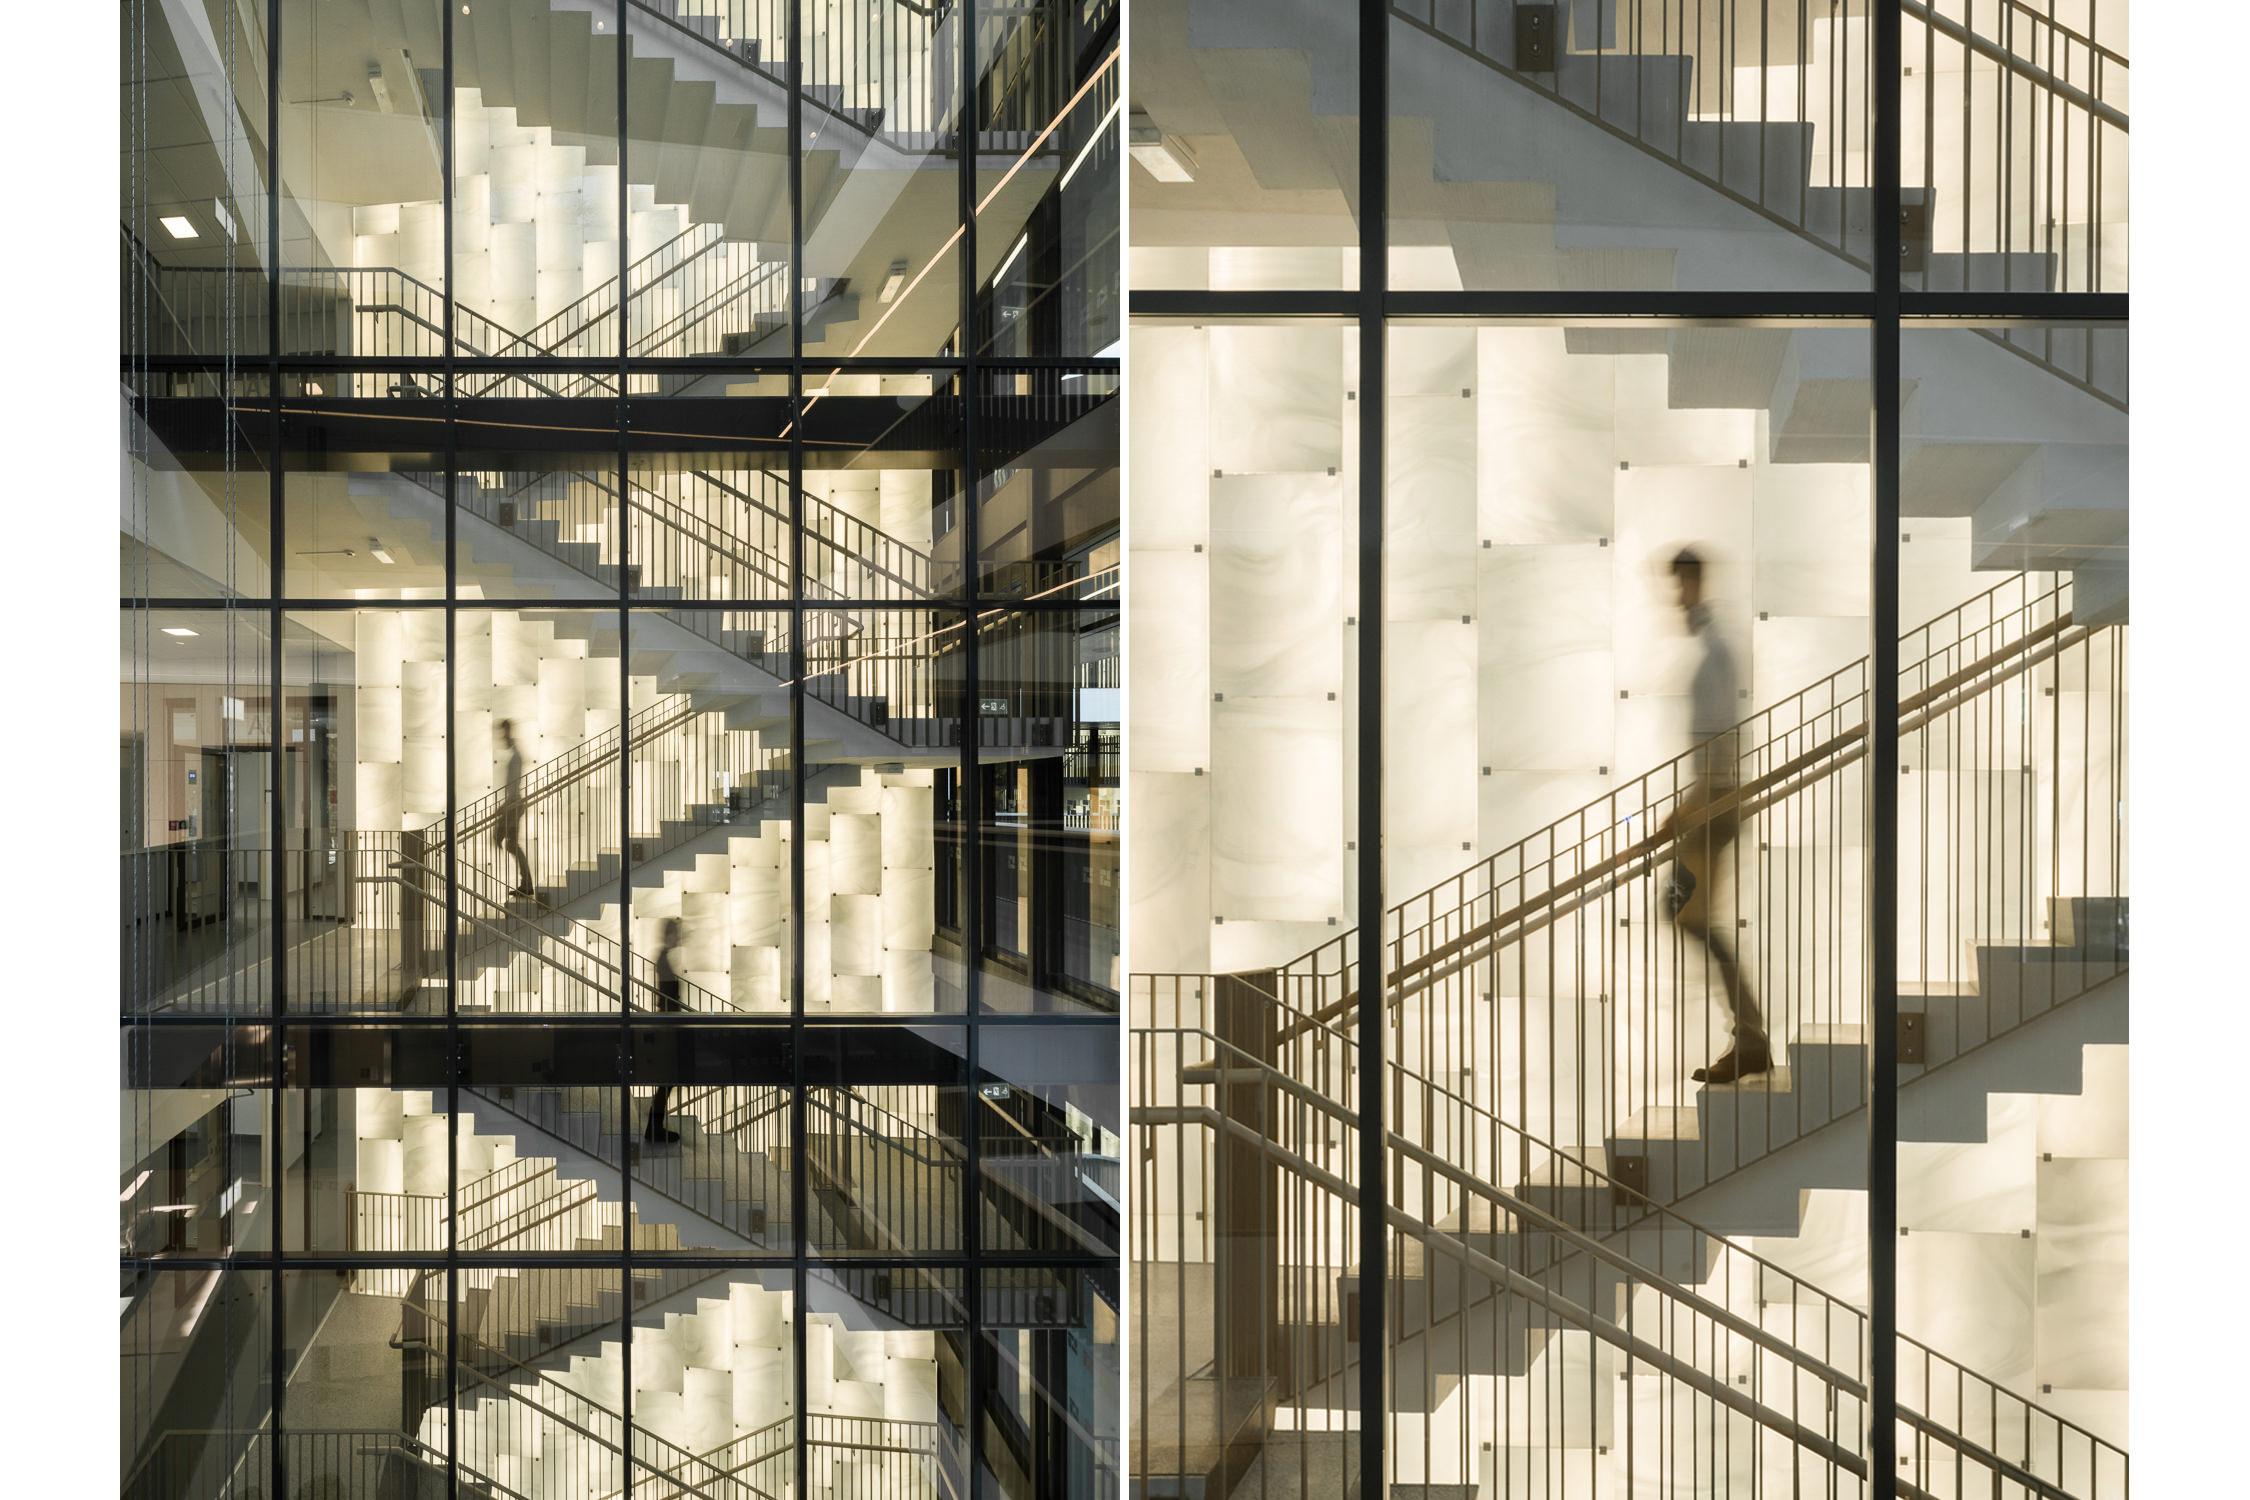 mark-hadden-architecture-photographer-london-amsterdam-Biomedicum-193 copy.jpg